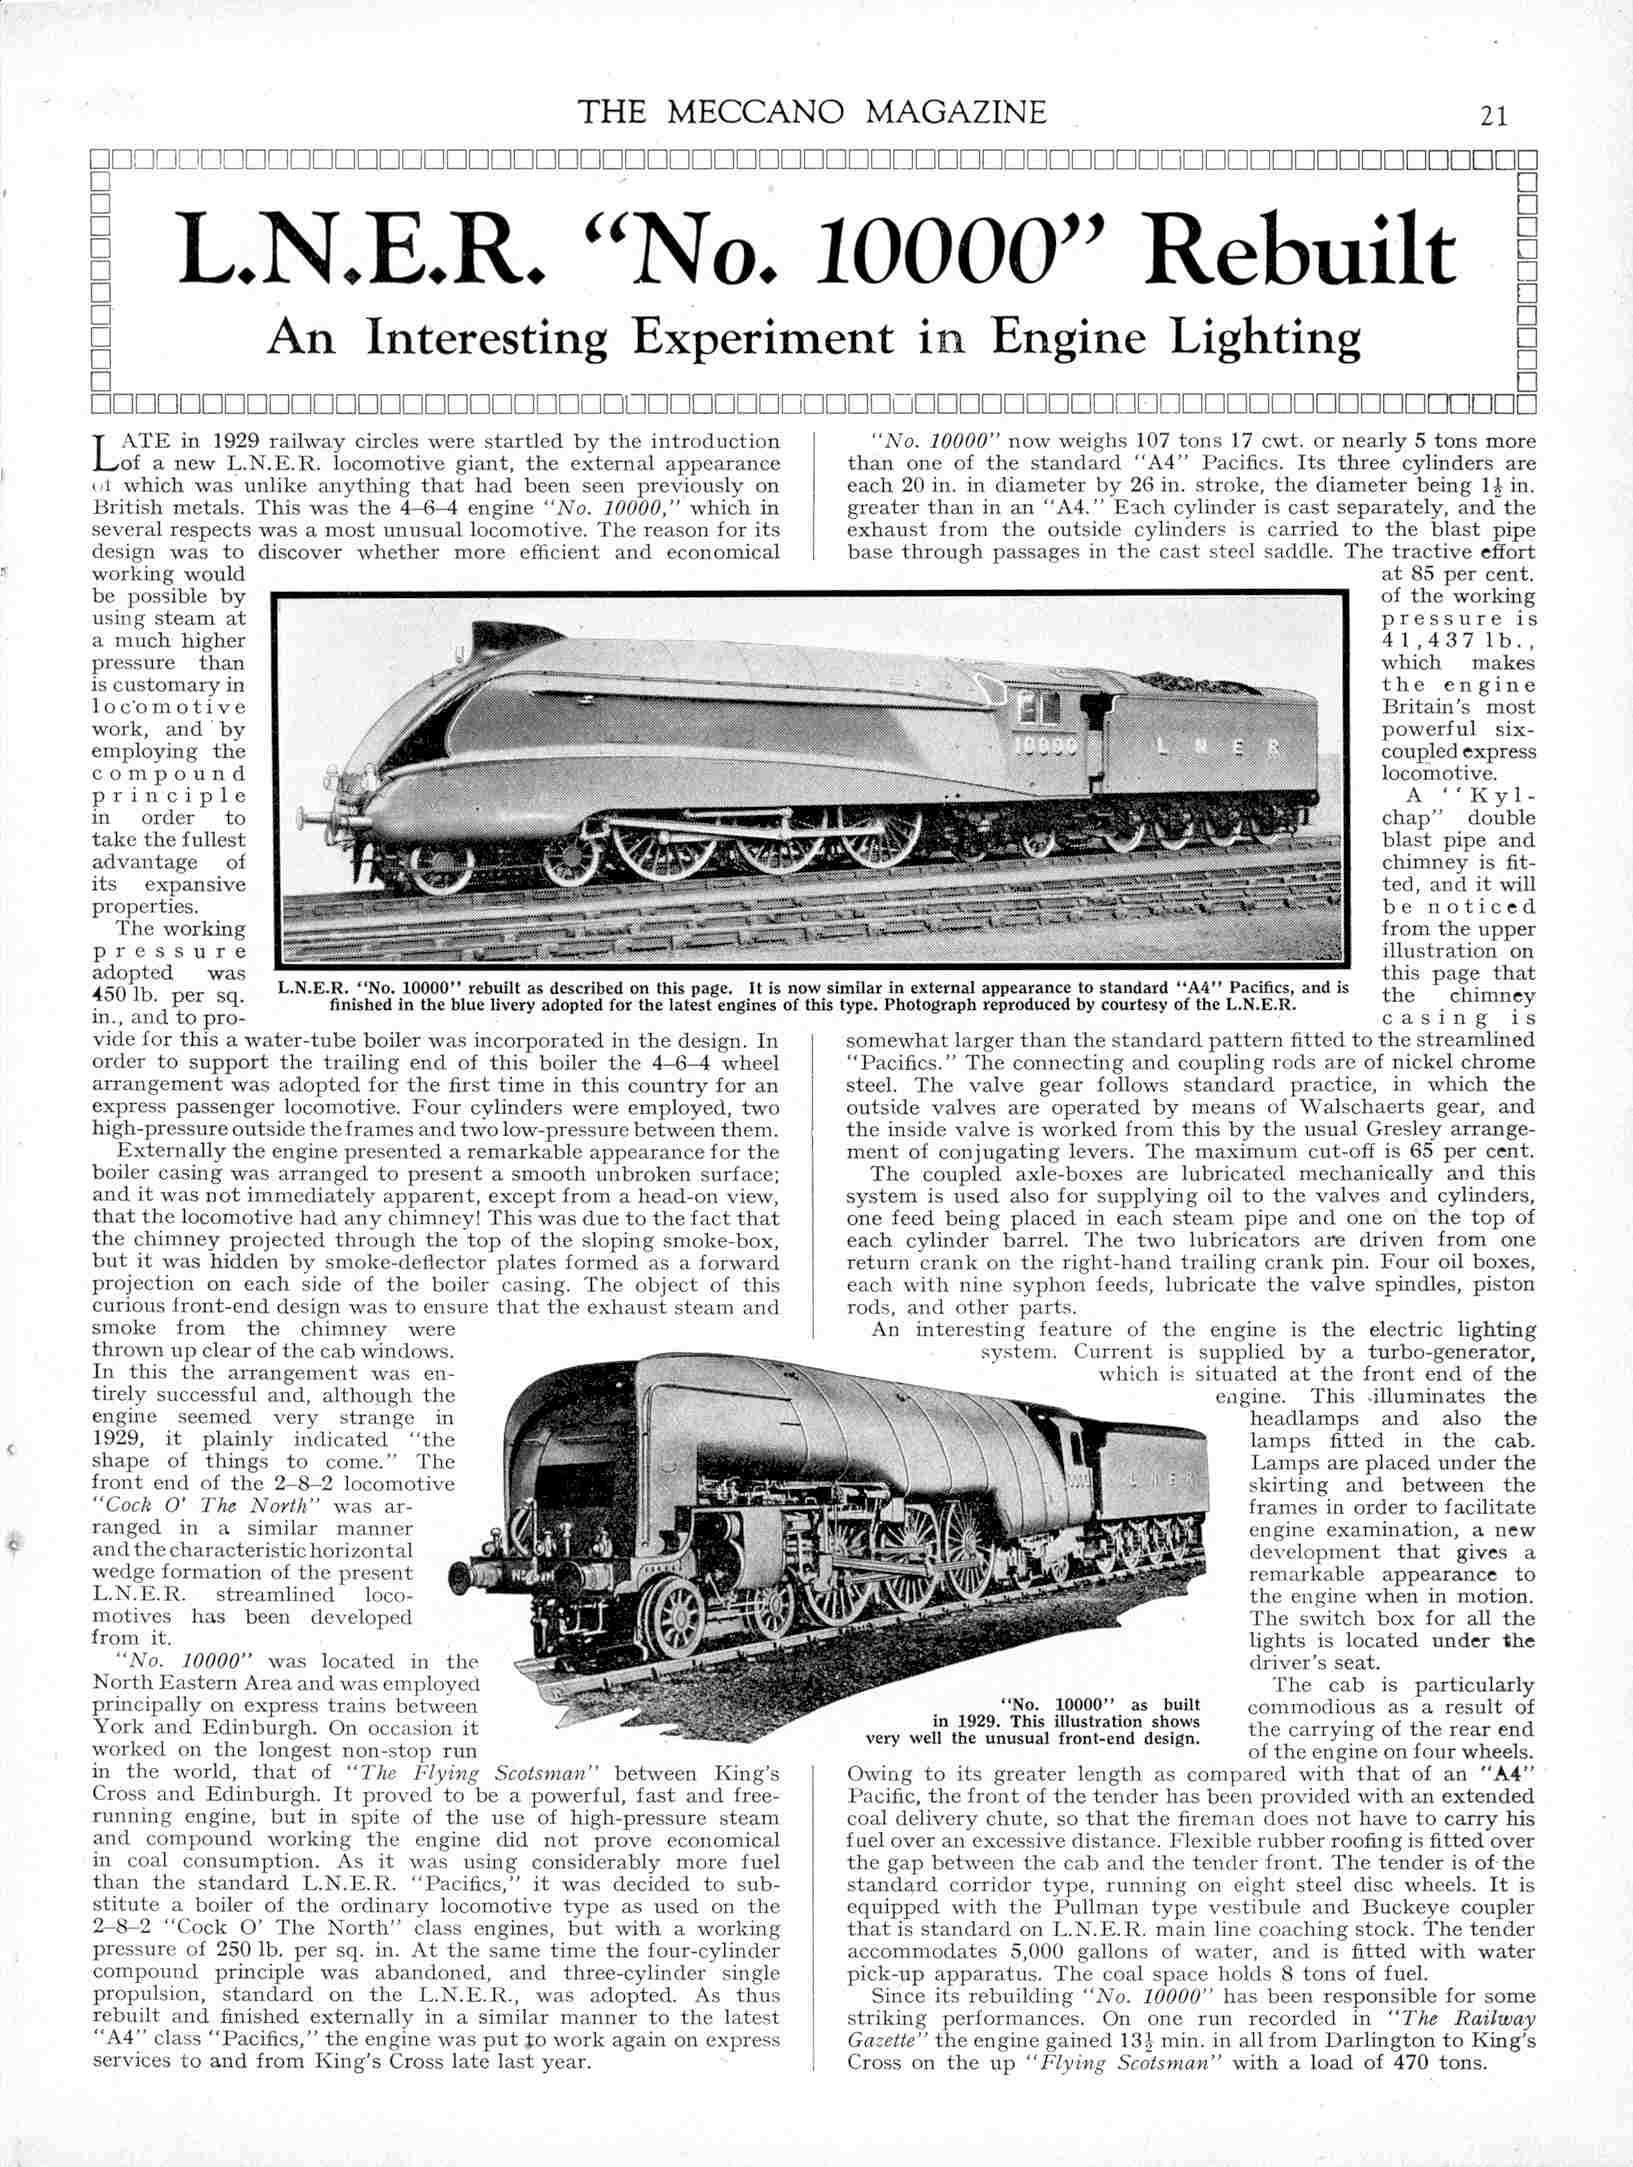 UK Meccano Magazine January 1938 Page 21